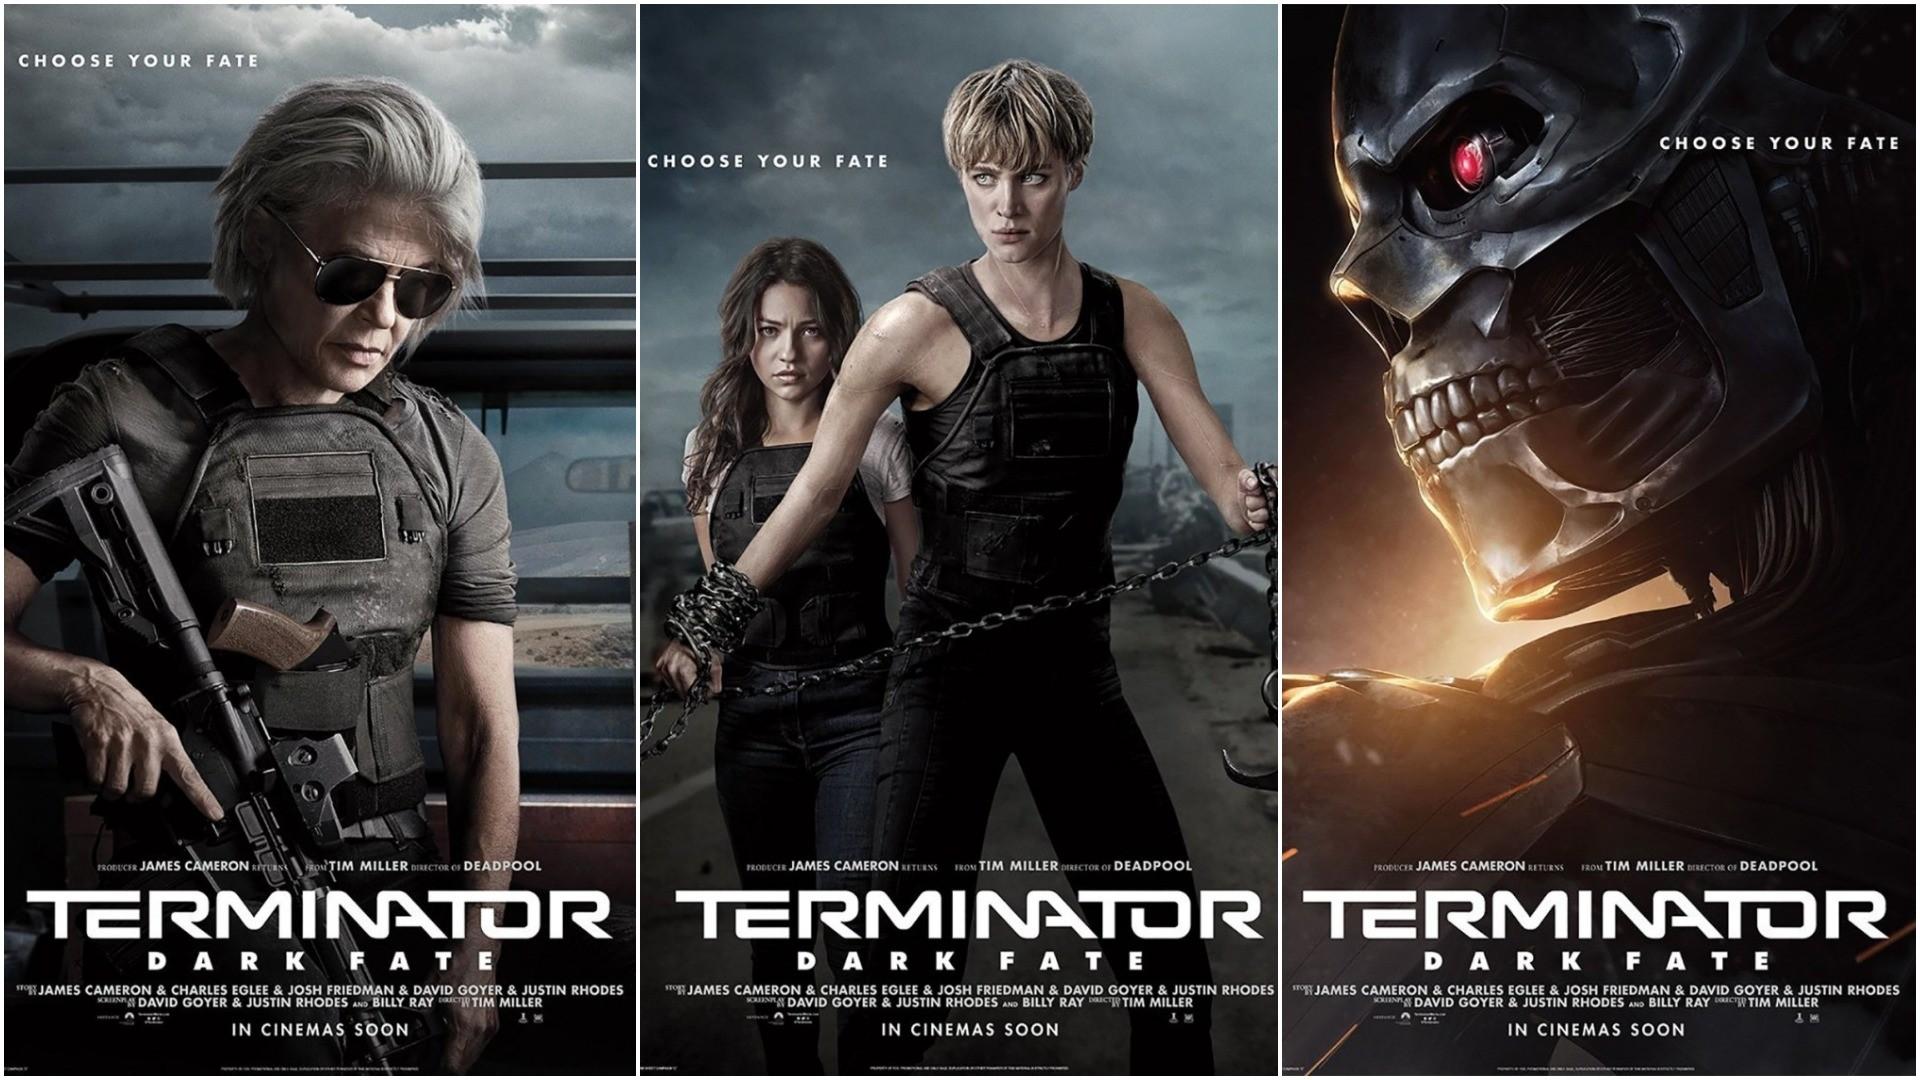 Terminator: Dark Fate posters